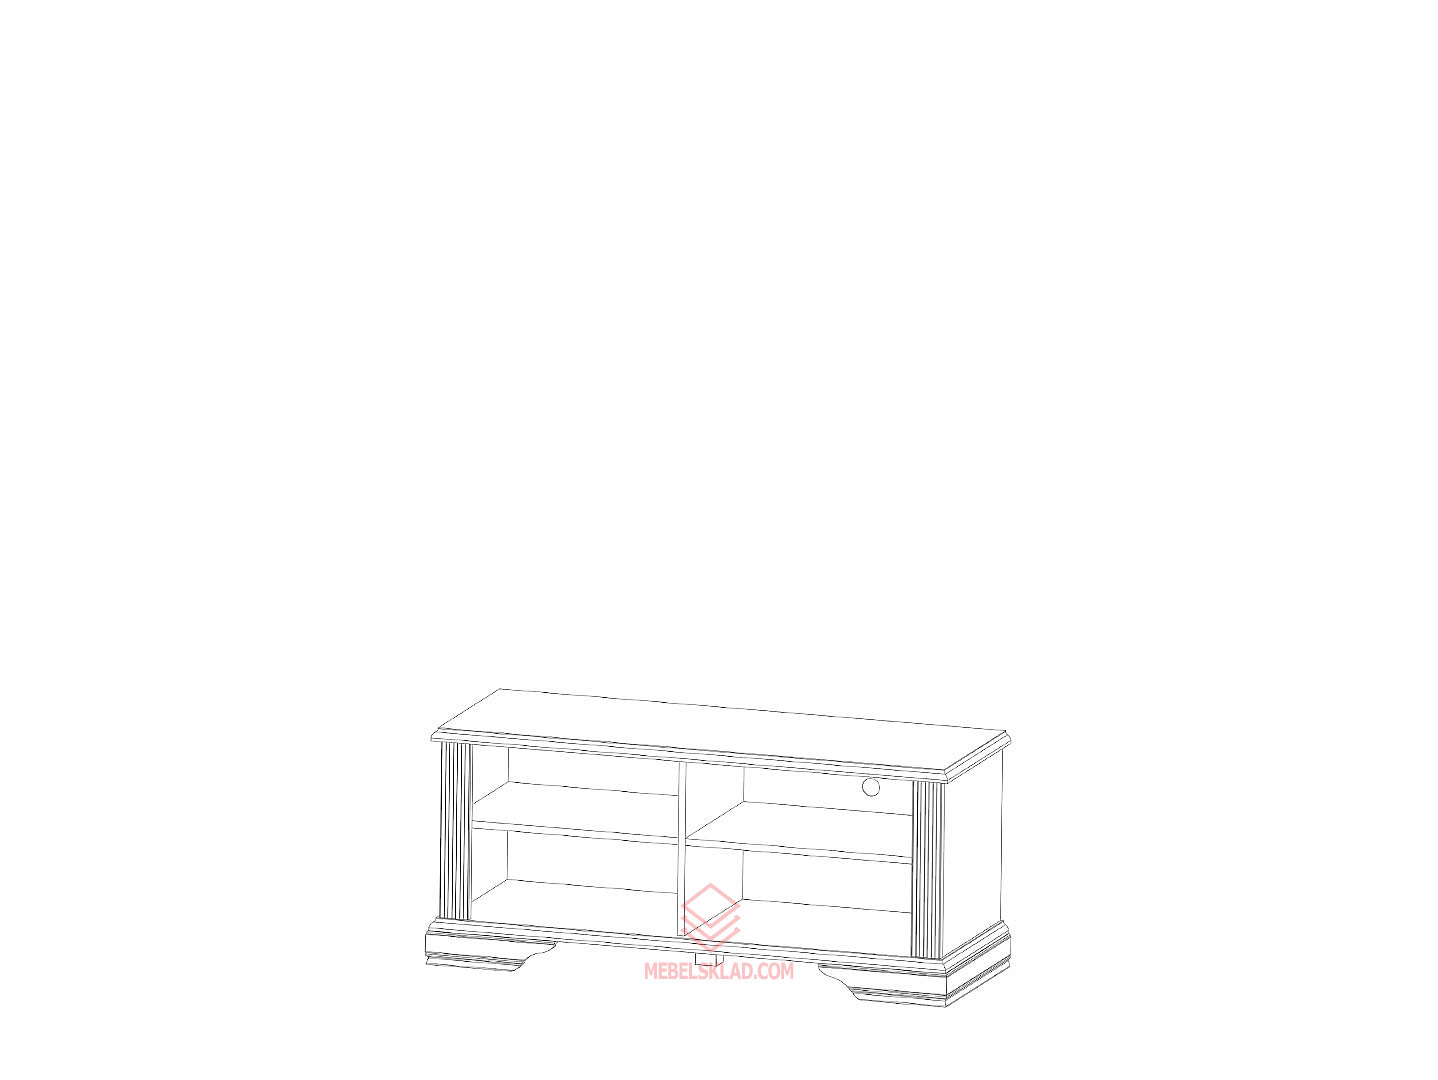 Тумба РТВ 120 сосна серебряная ВАЙТ за 7060 ₽